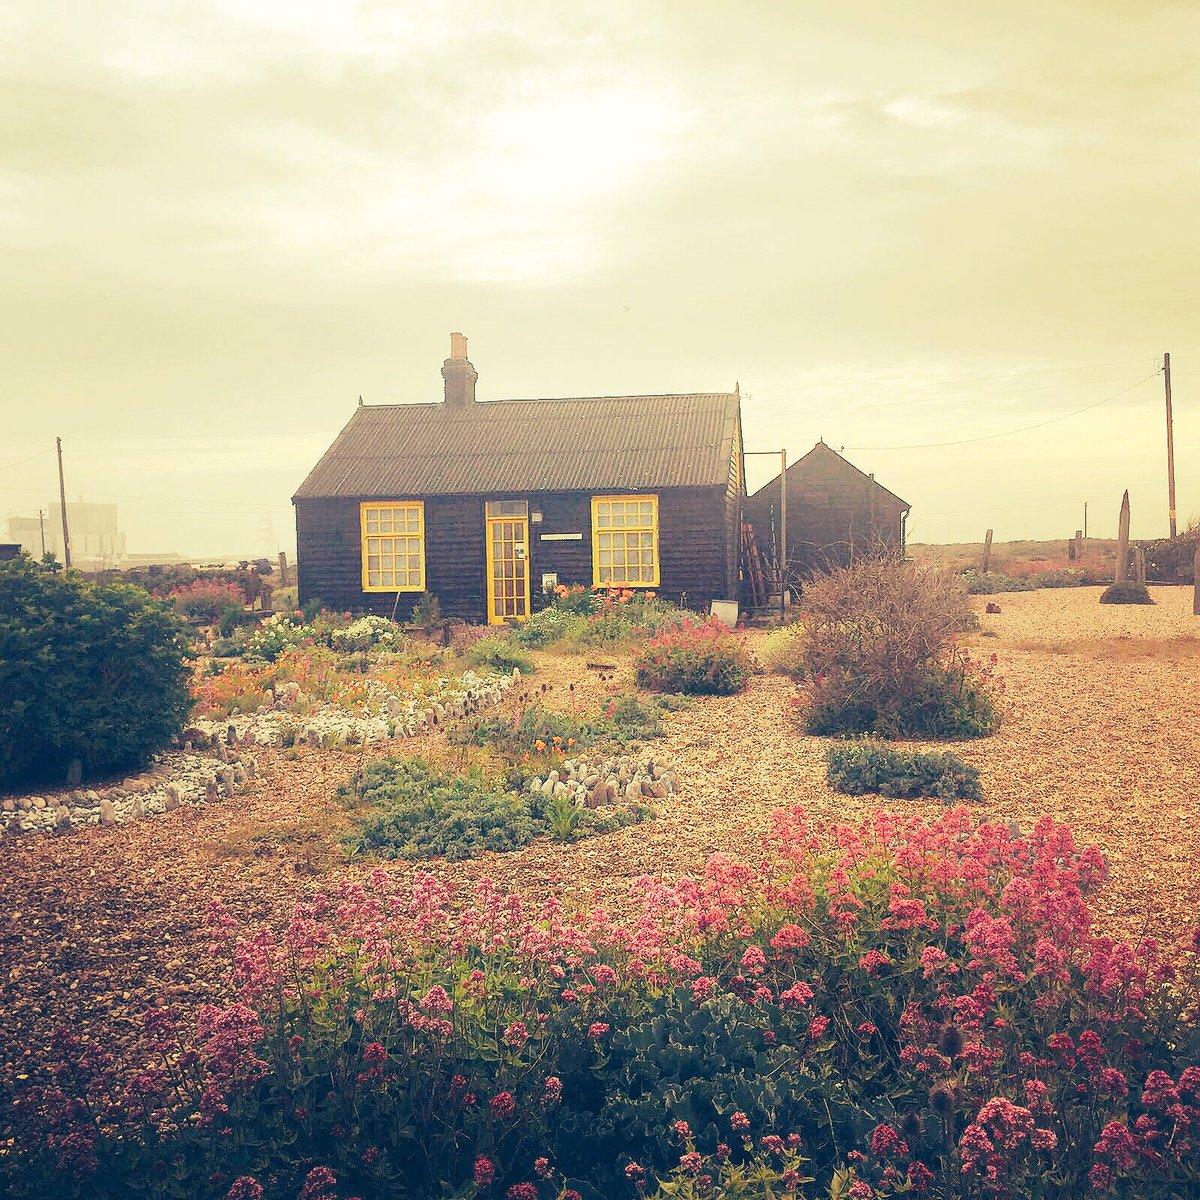 Prospect Cottage #DerekJarmanGarden #Dungeness #Kent ⚡️????????⛔️???? https://t.co/DXyBQryq2j